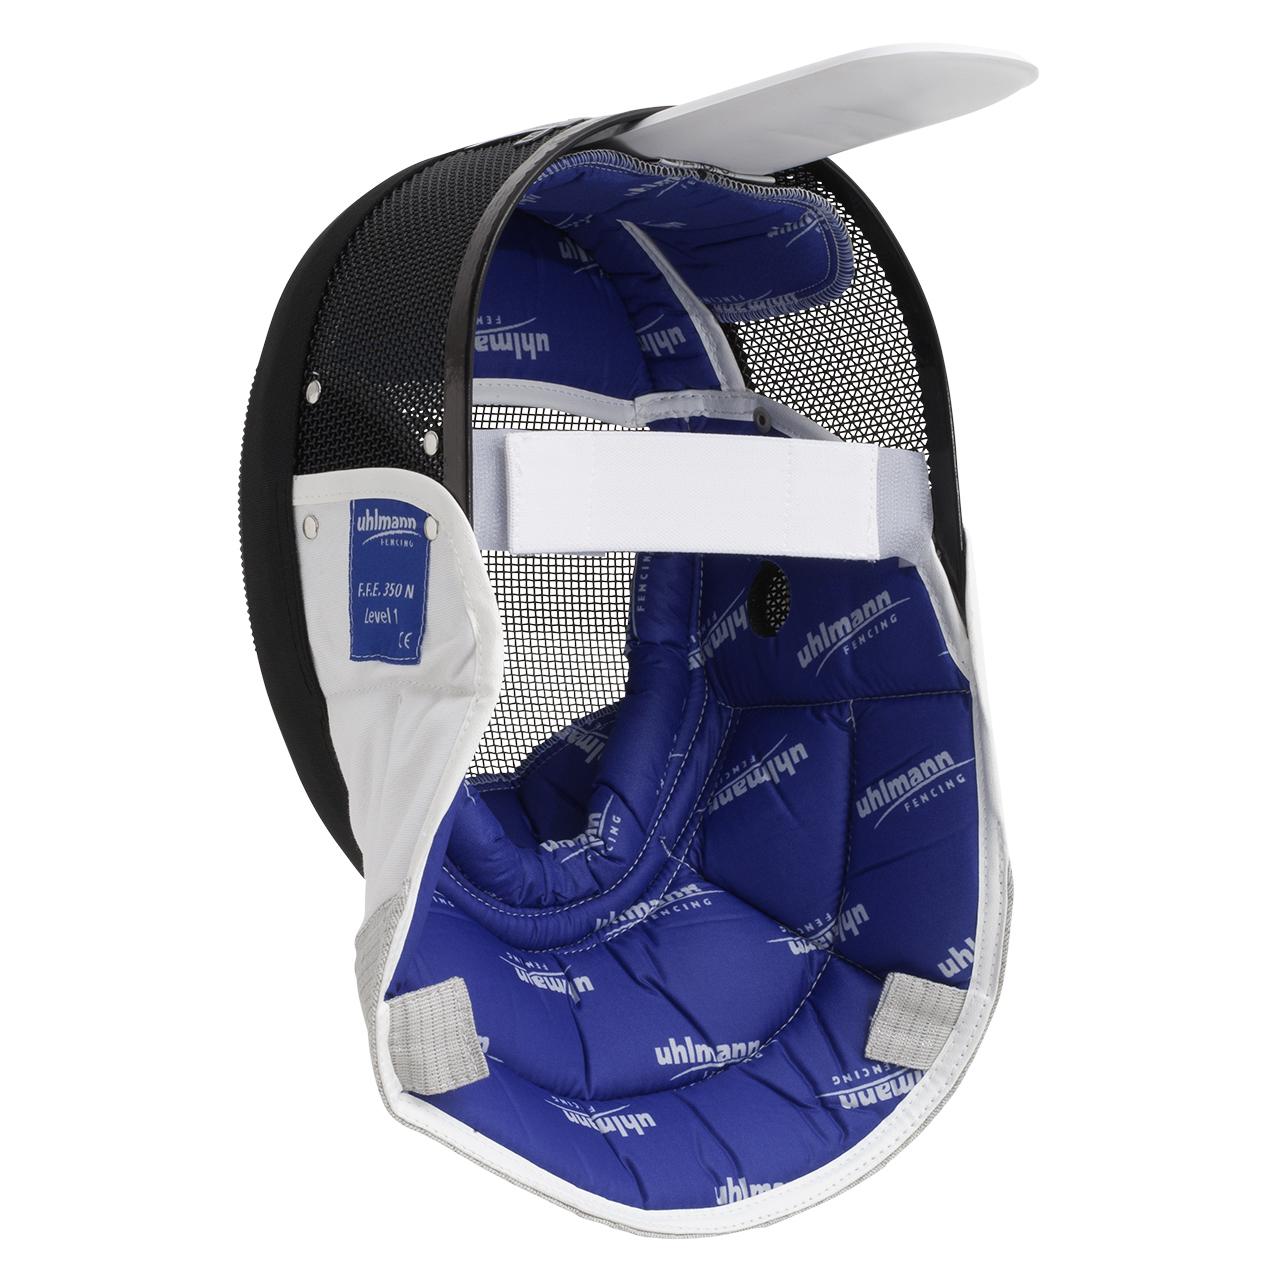 Standard-Florett-Maske 350N